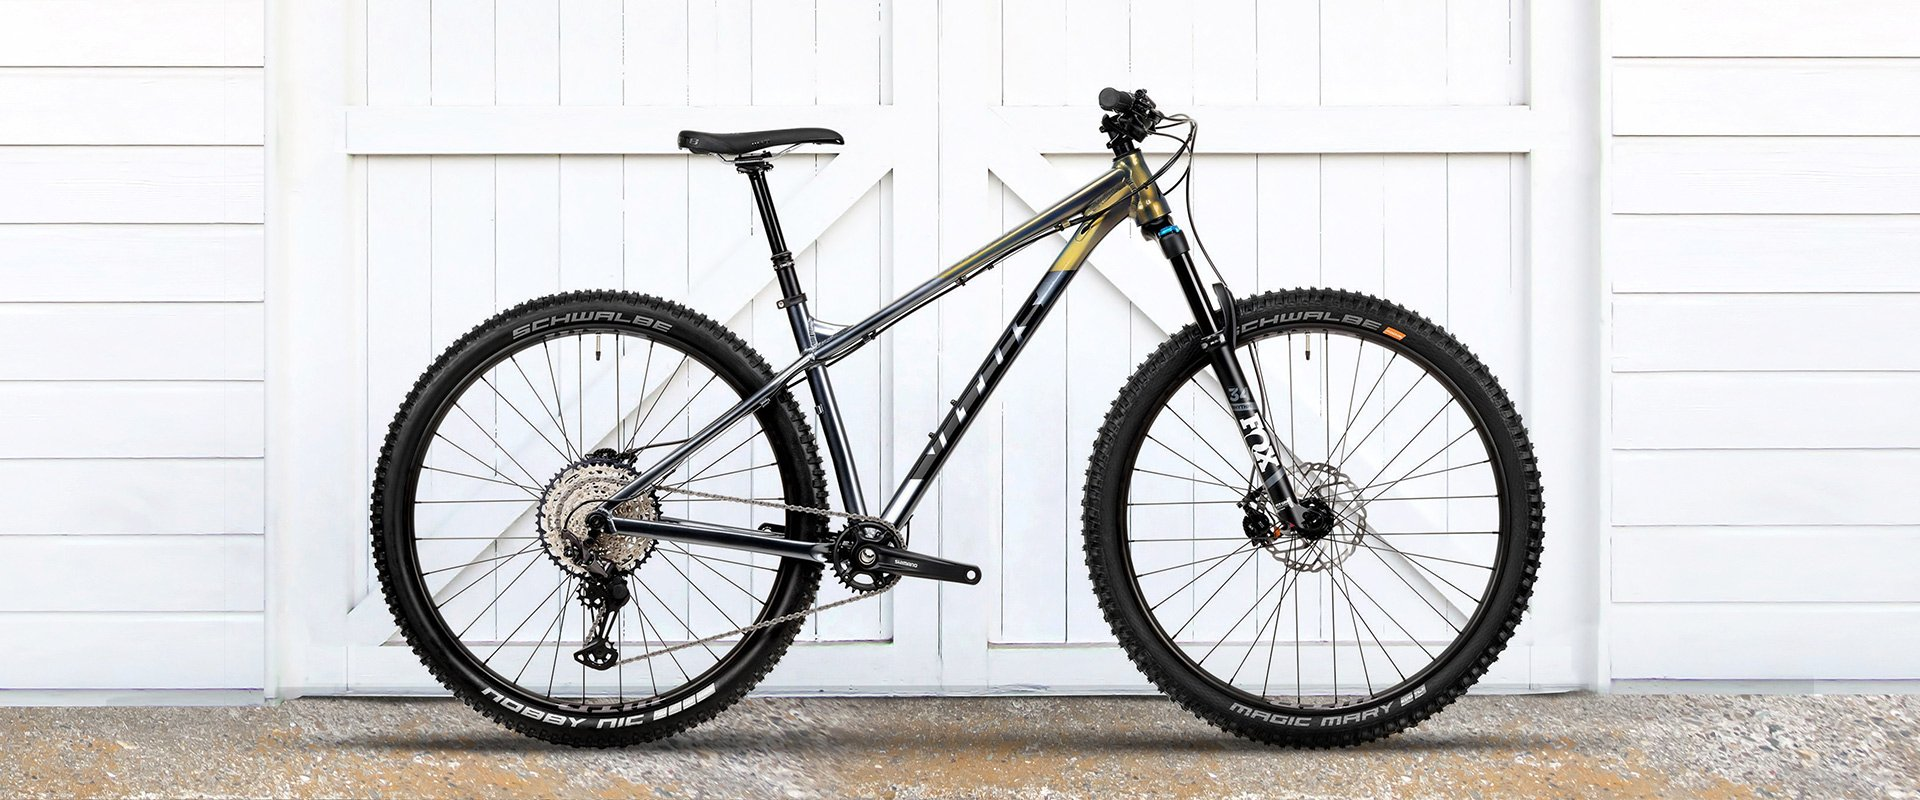 Sentier 29 VRX Bike XT SLX 1x12